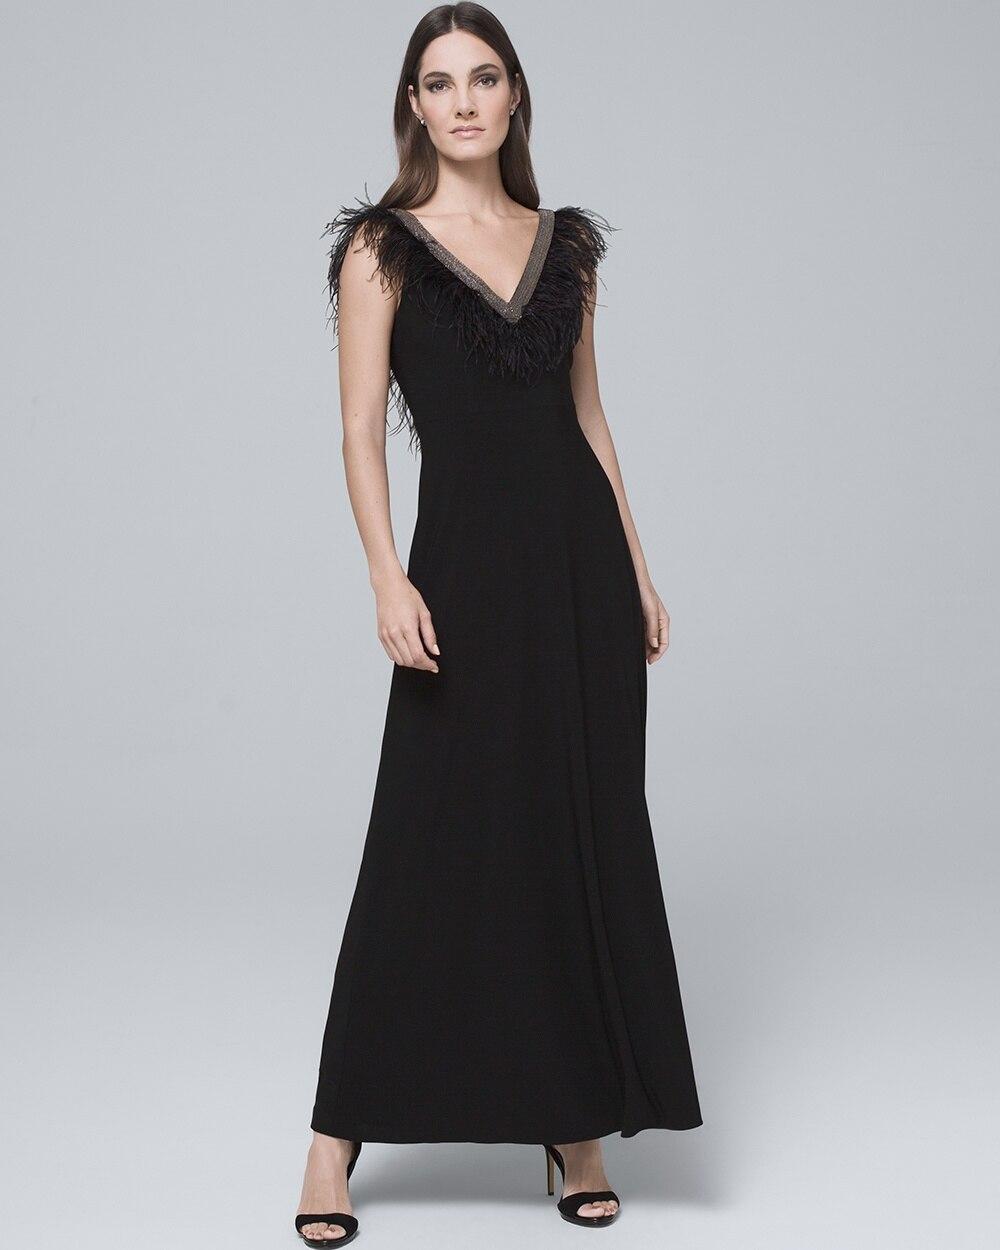 6cdbb53b1a60 Feather-Trim Black Gown - White House Black Market